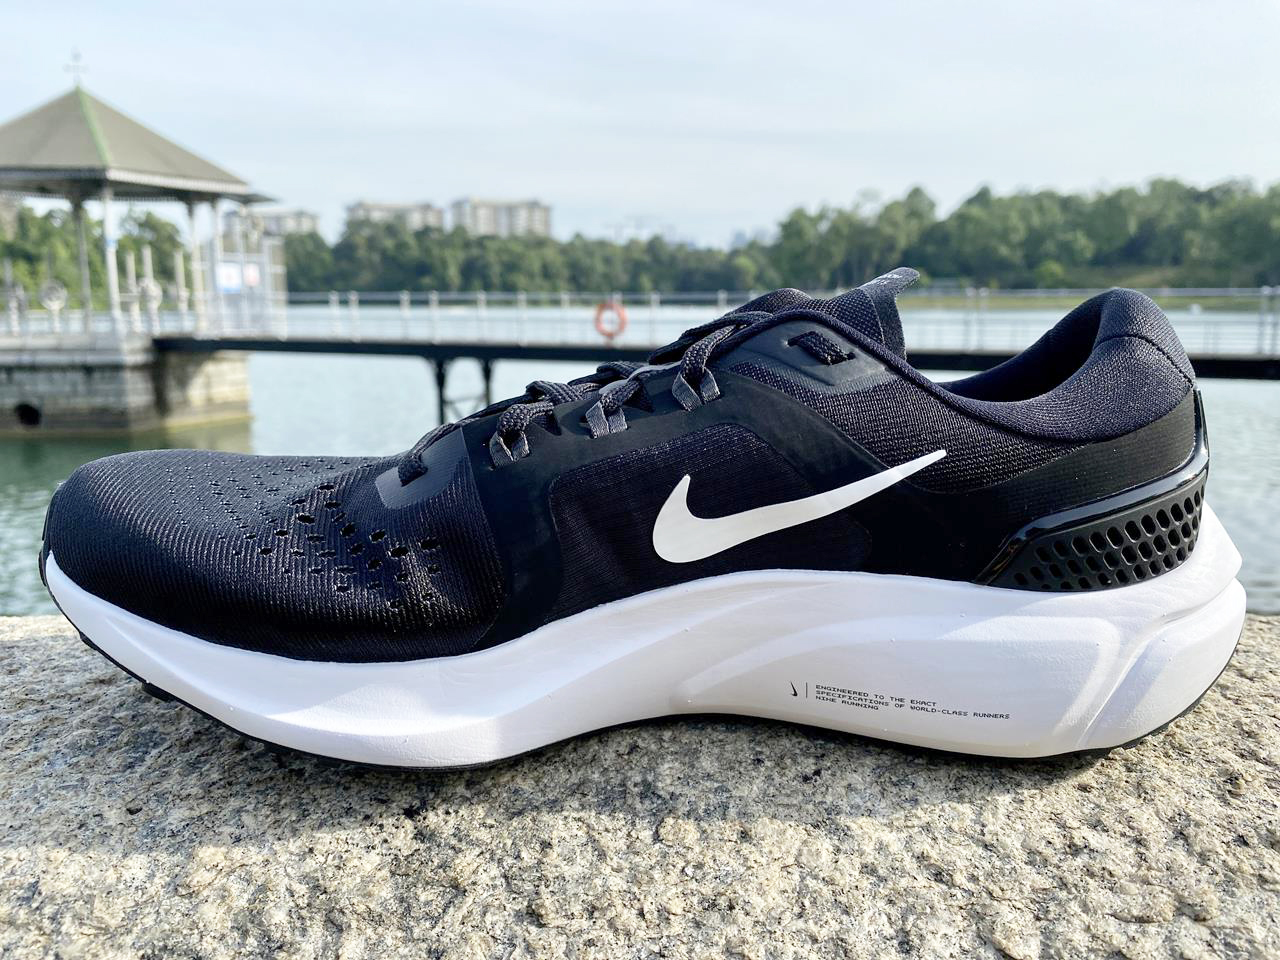 Nike Air Zoom Vomero 15 - Medial Side